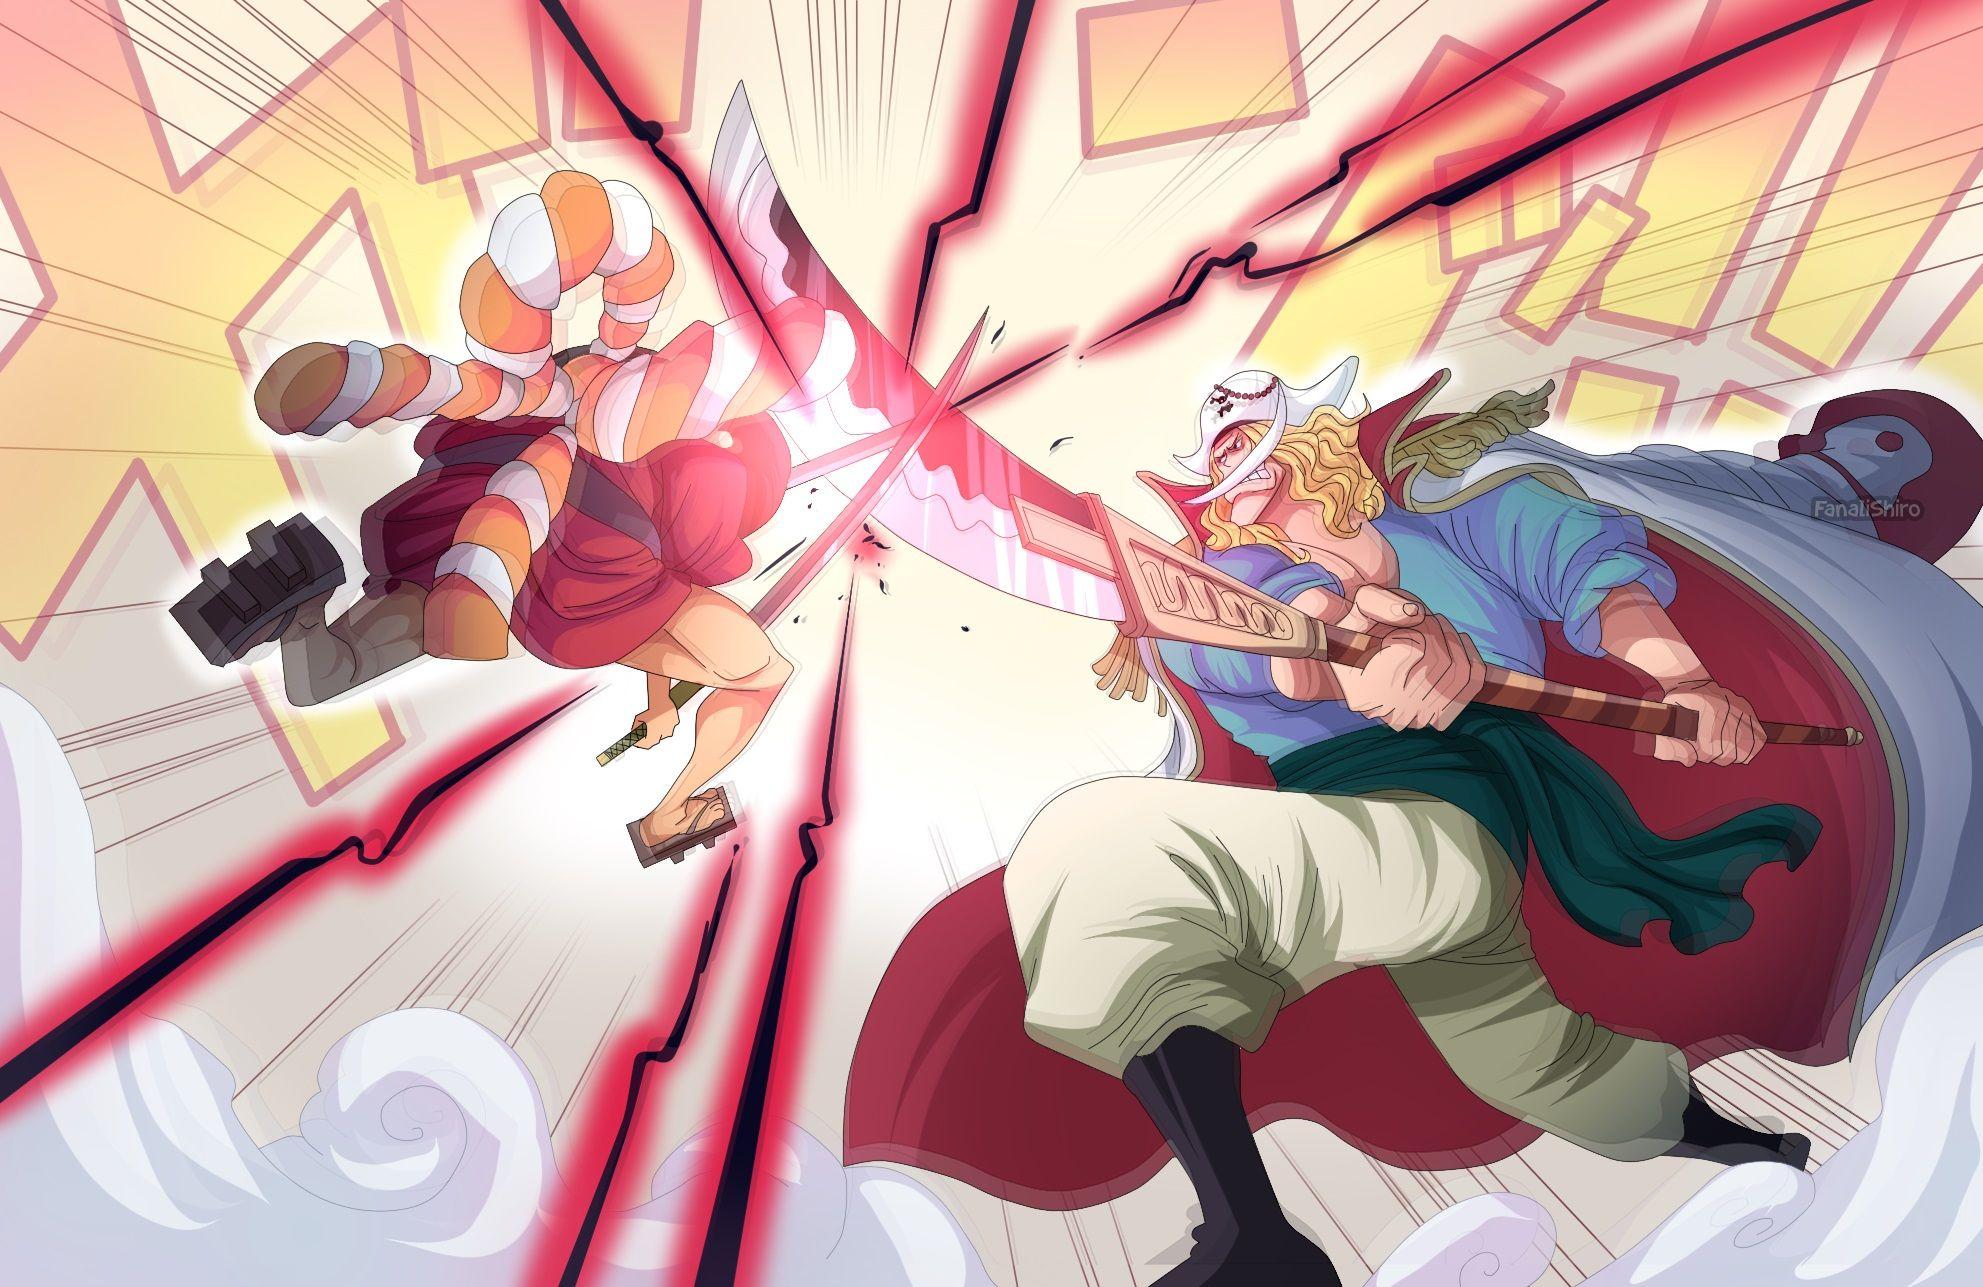 Kiku One Piece Wallpapers - Wallpaper Cave